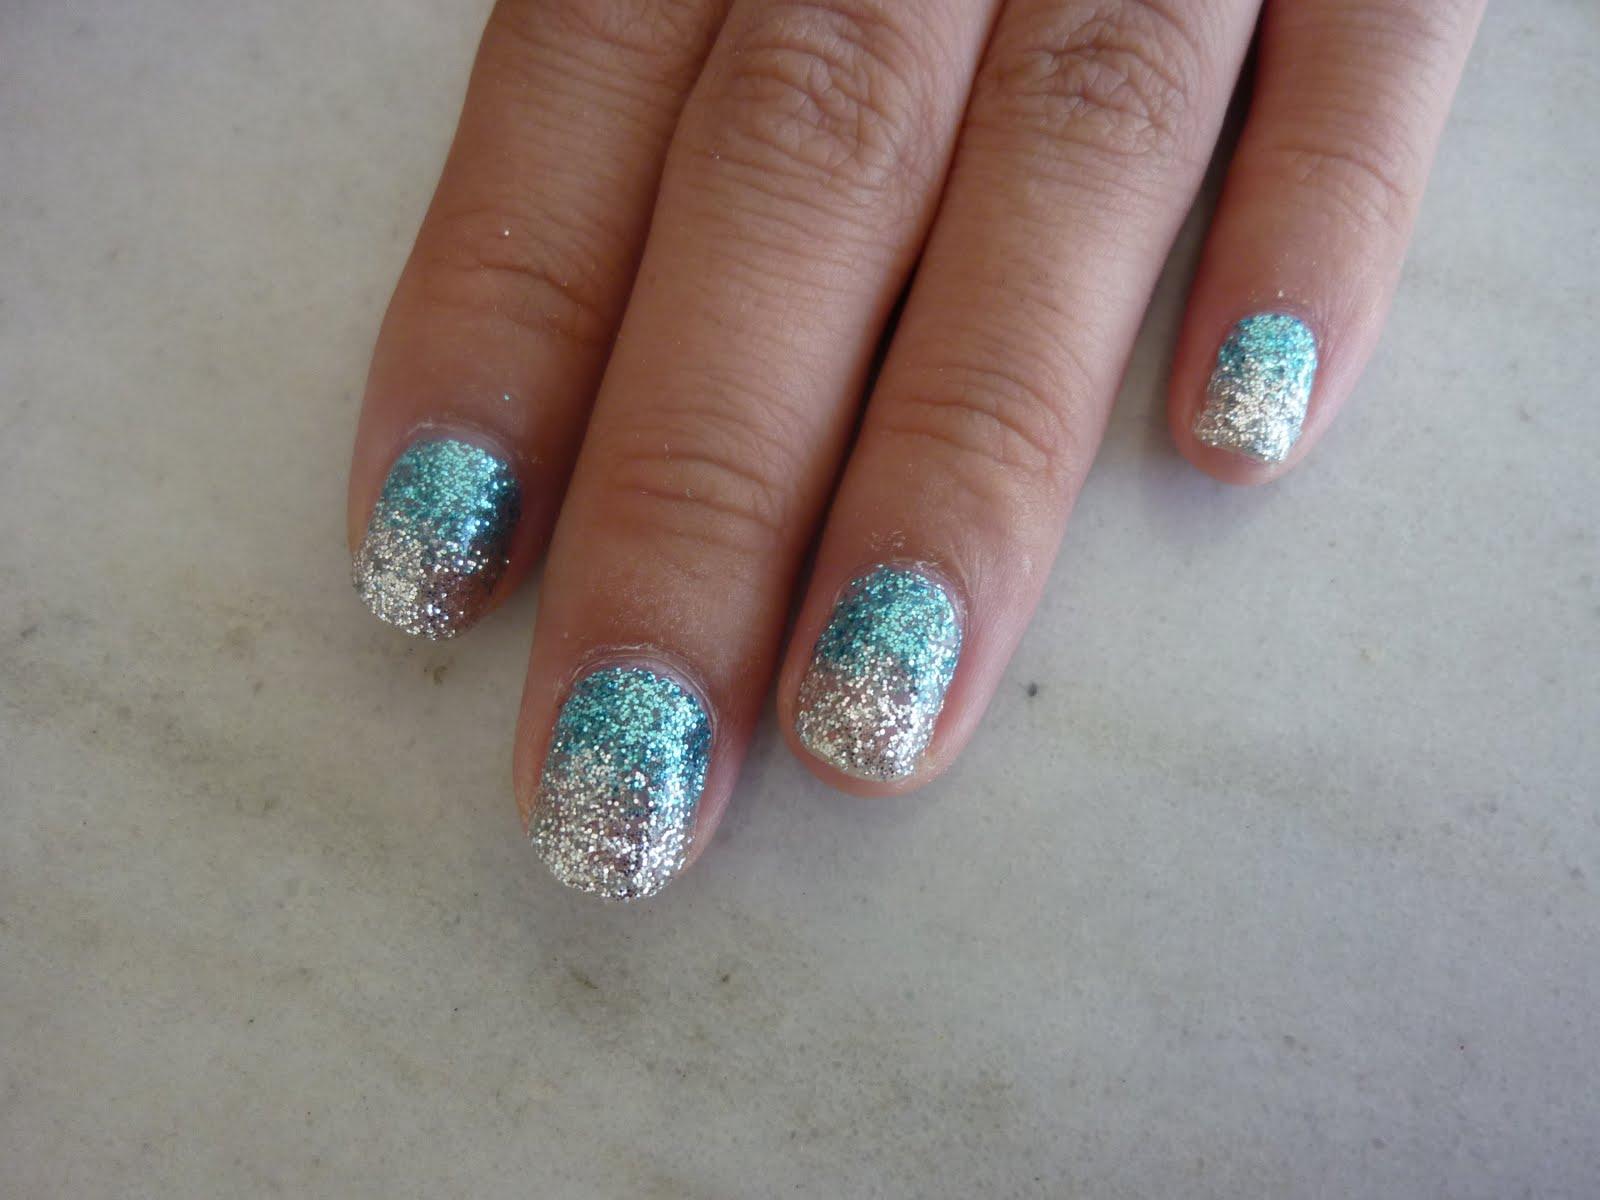 13 Silver Glitter Nail Designs Images - Cute Glitter ...